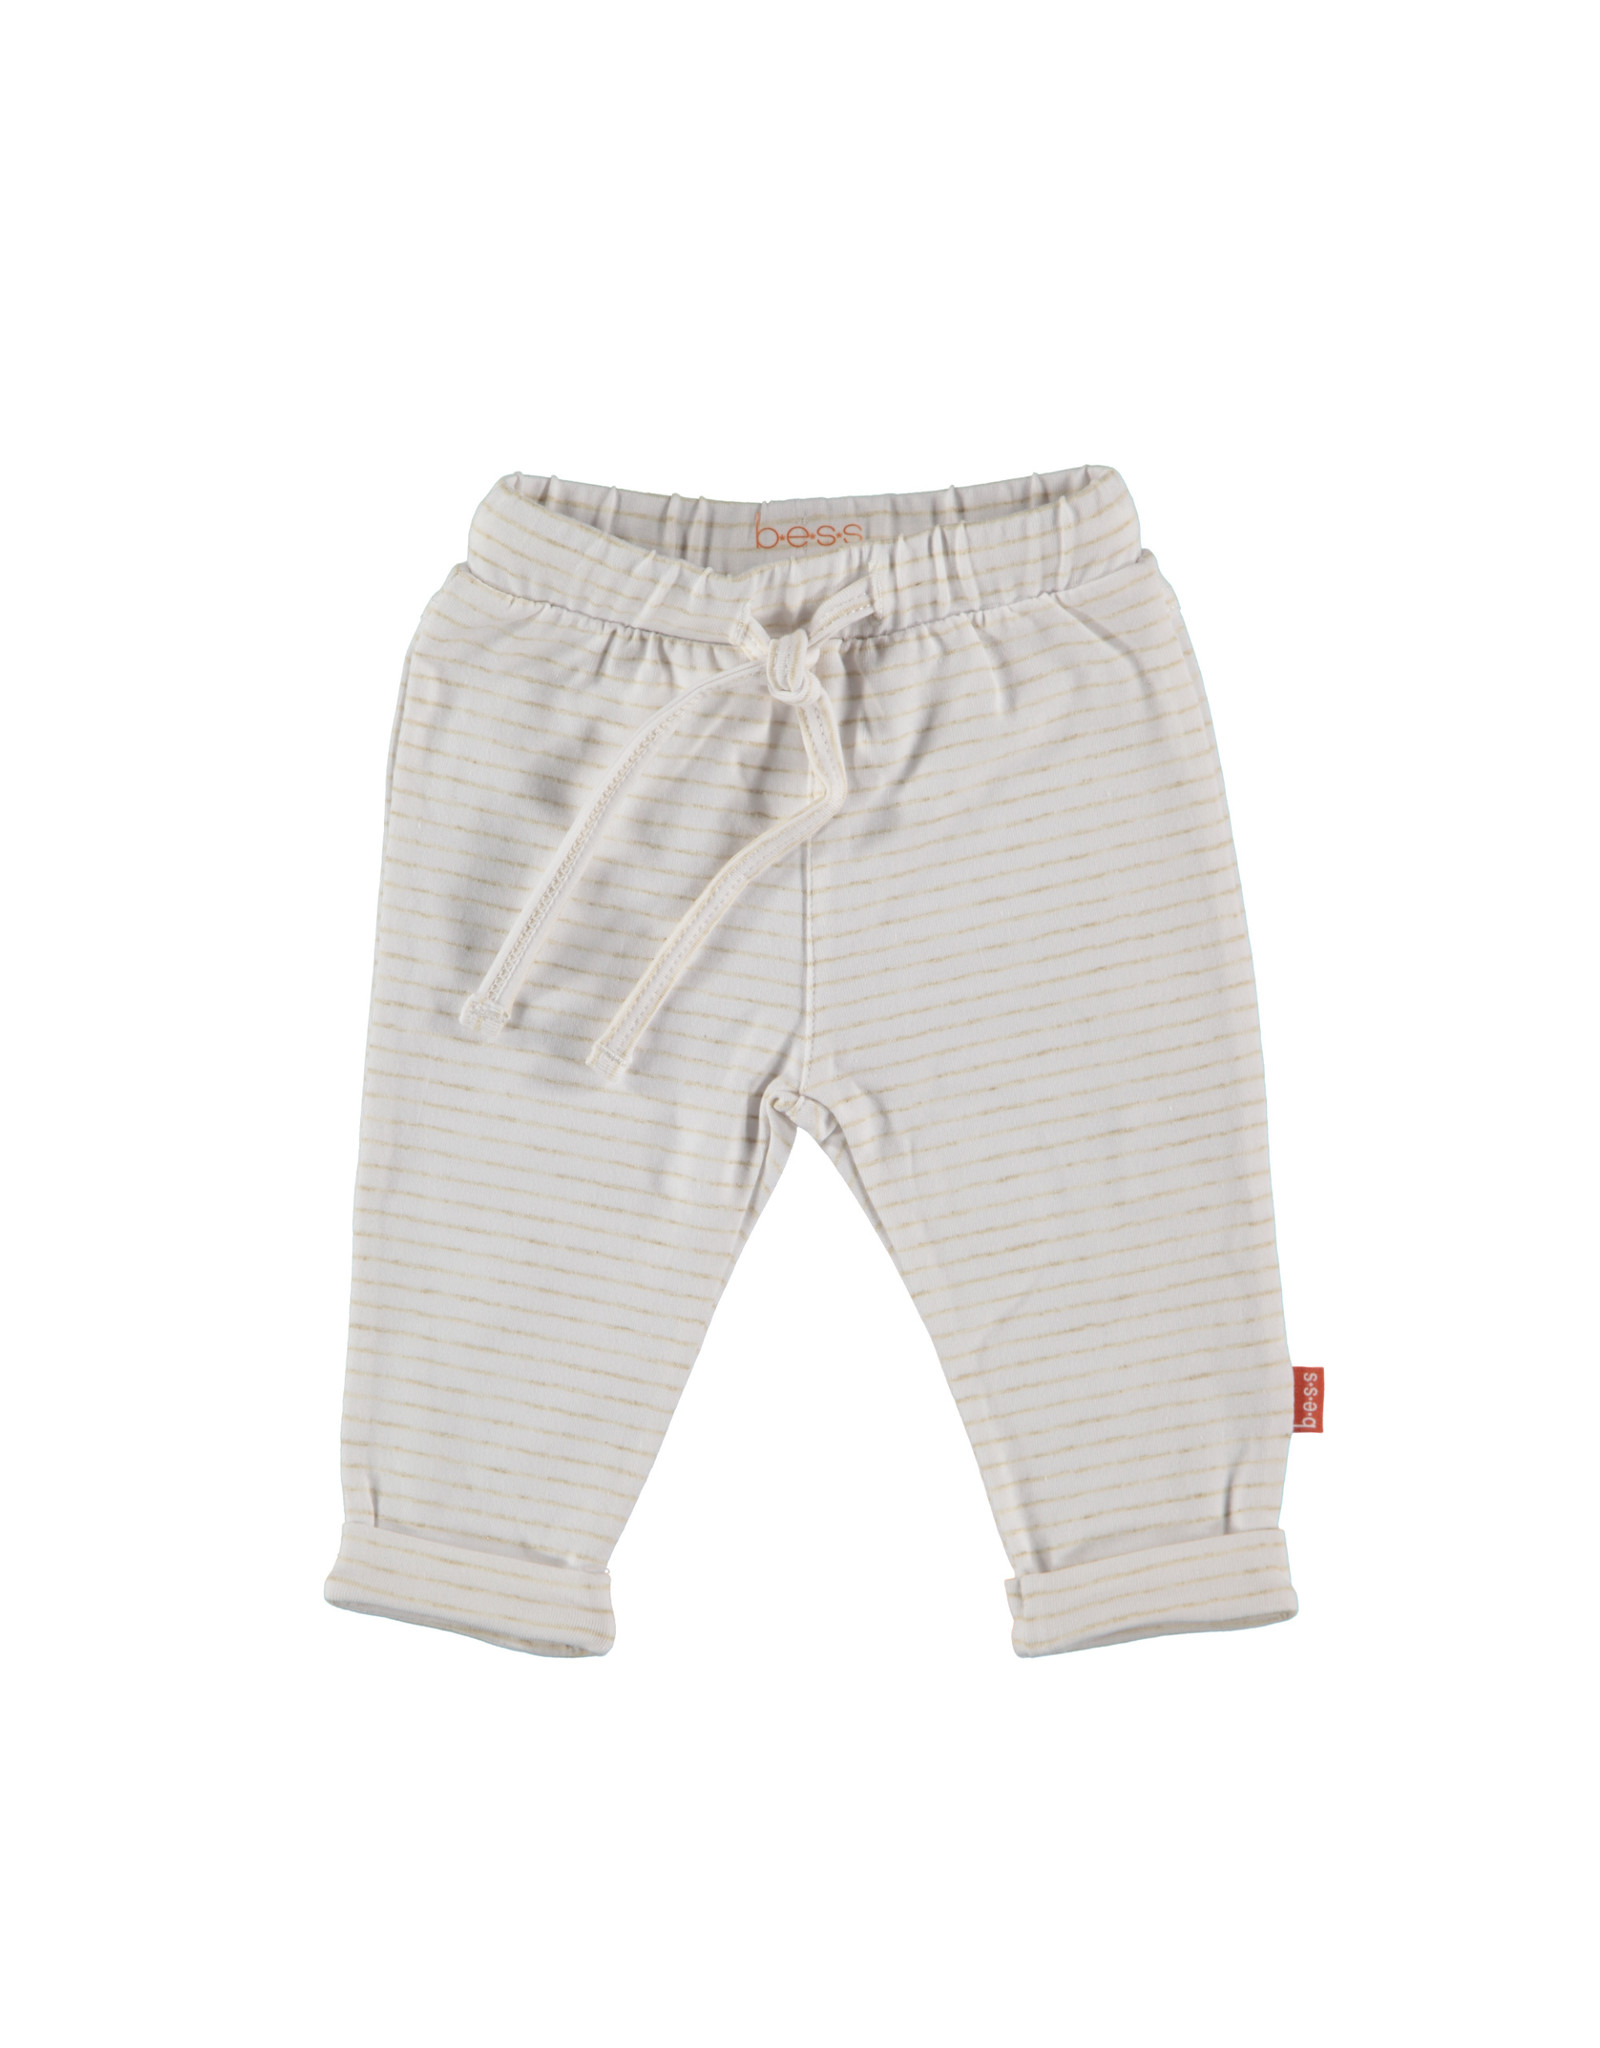 B.E.S.S. Pants Lines, White